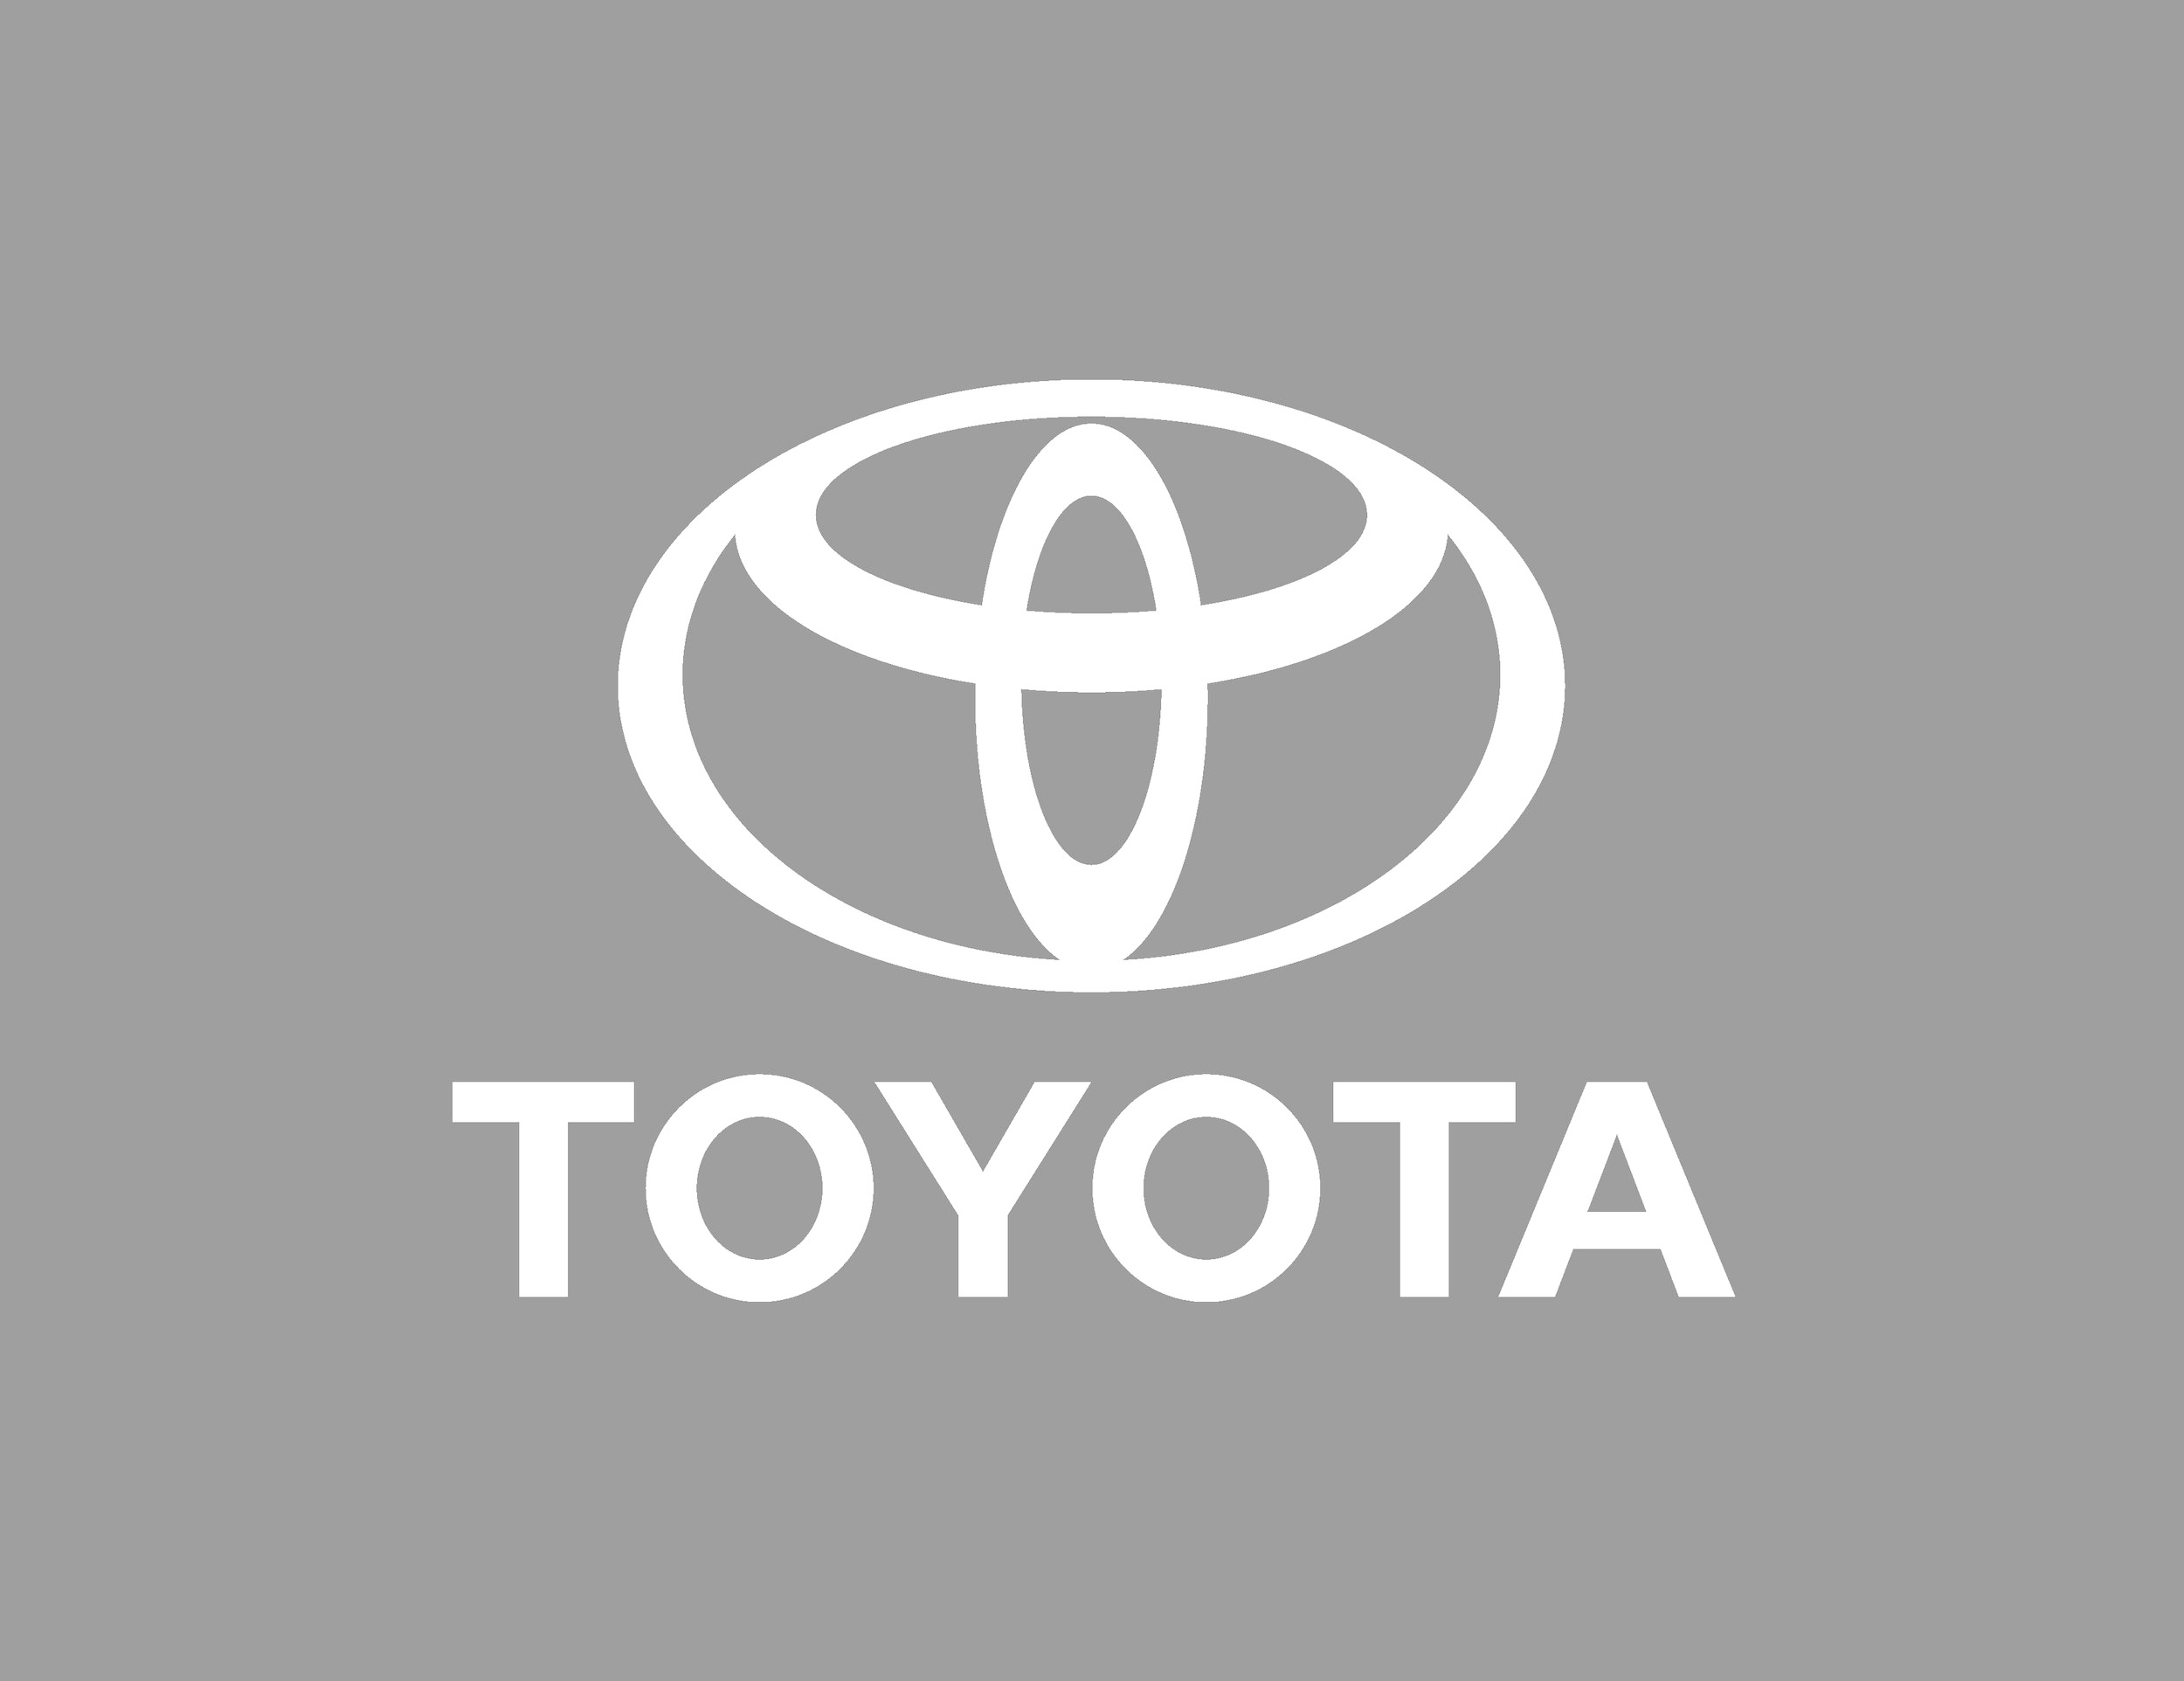 Toyota_logo-red_2.jpg